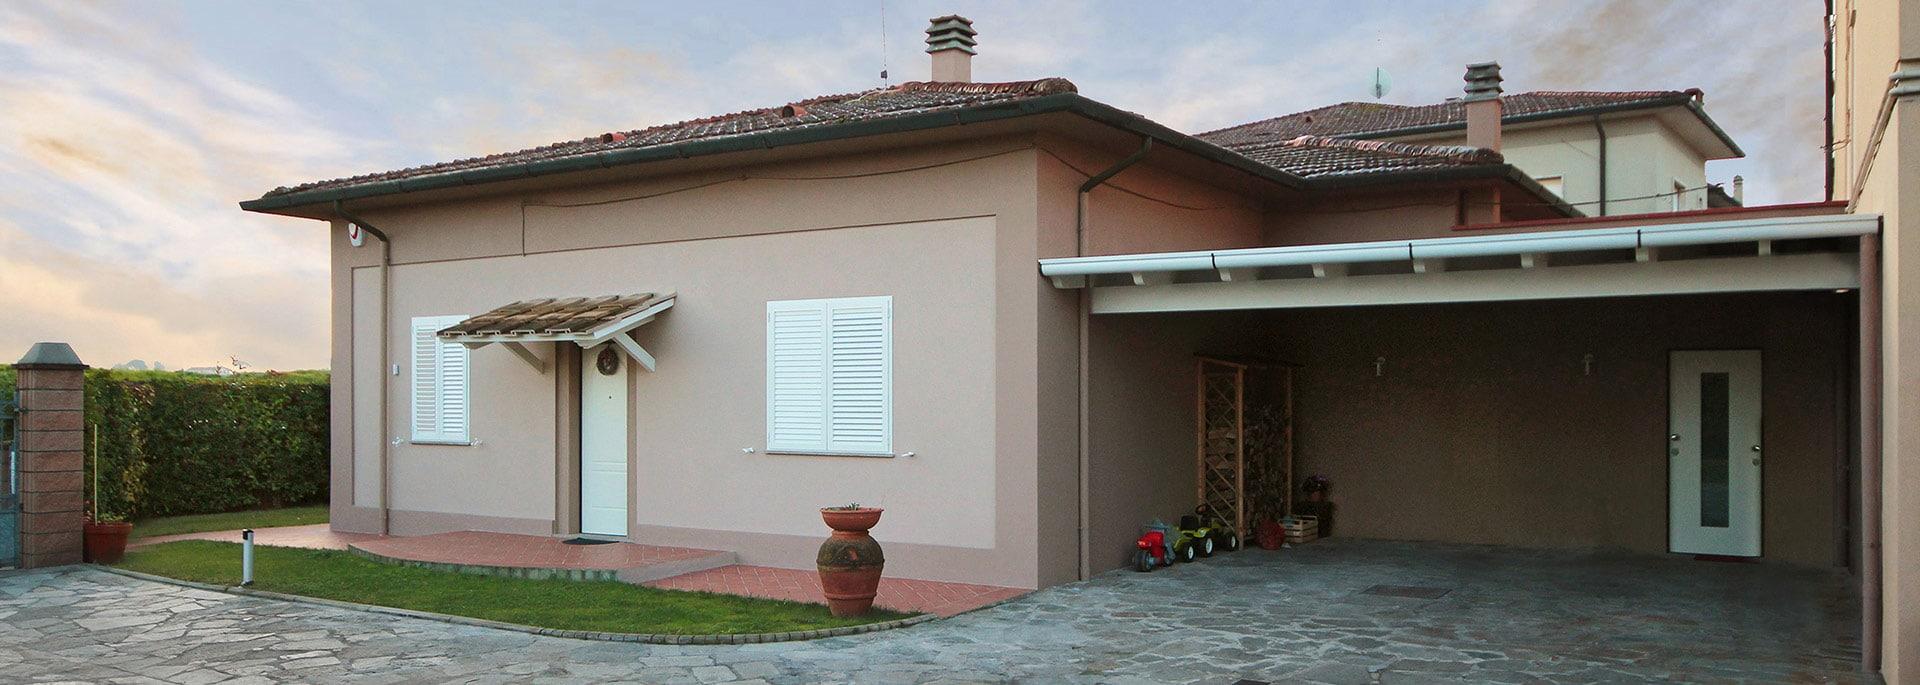 Arredamento Country Chic Moderno Villetta Toscana